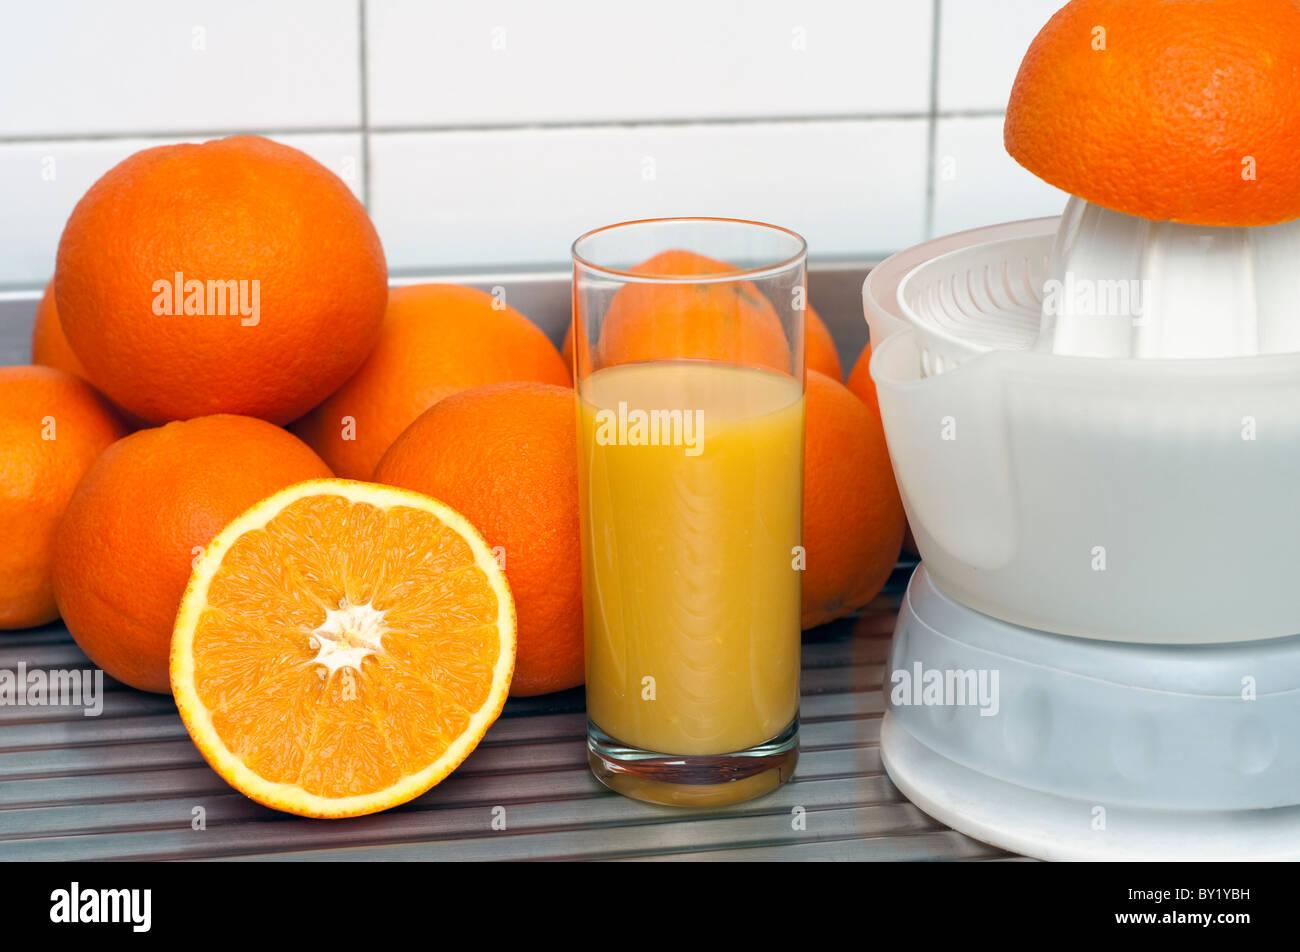 Preparing orange juice with a juice maker - Stock Image